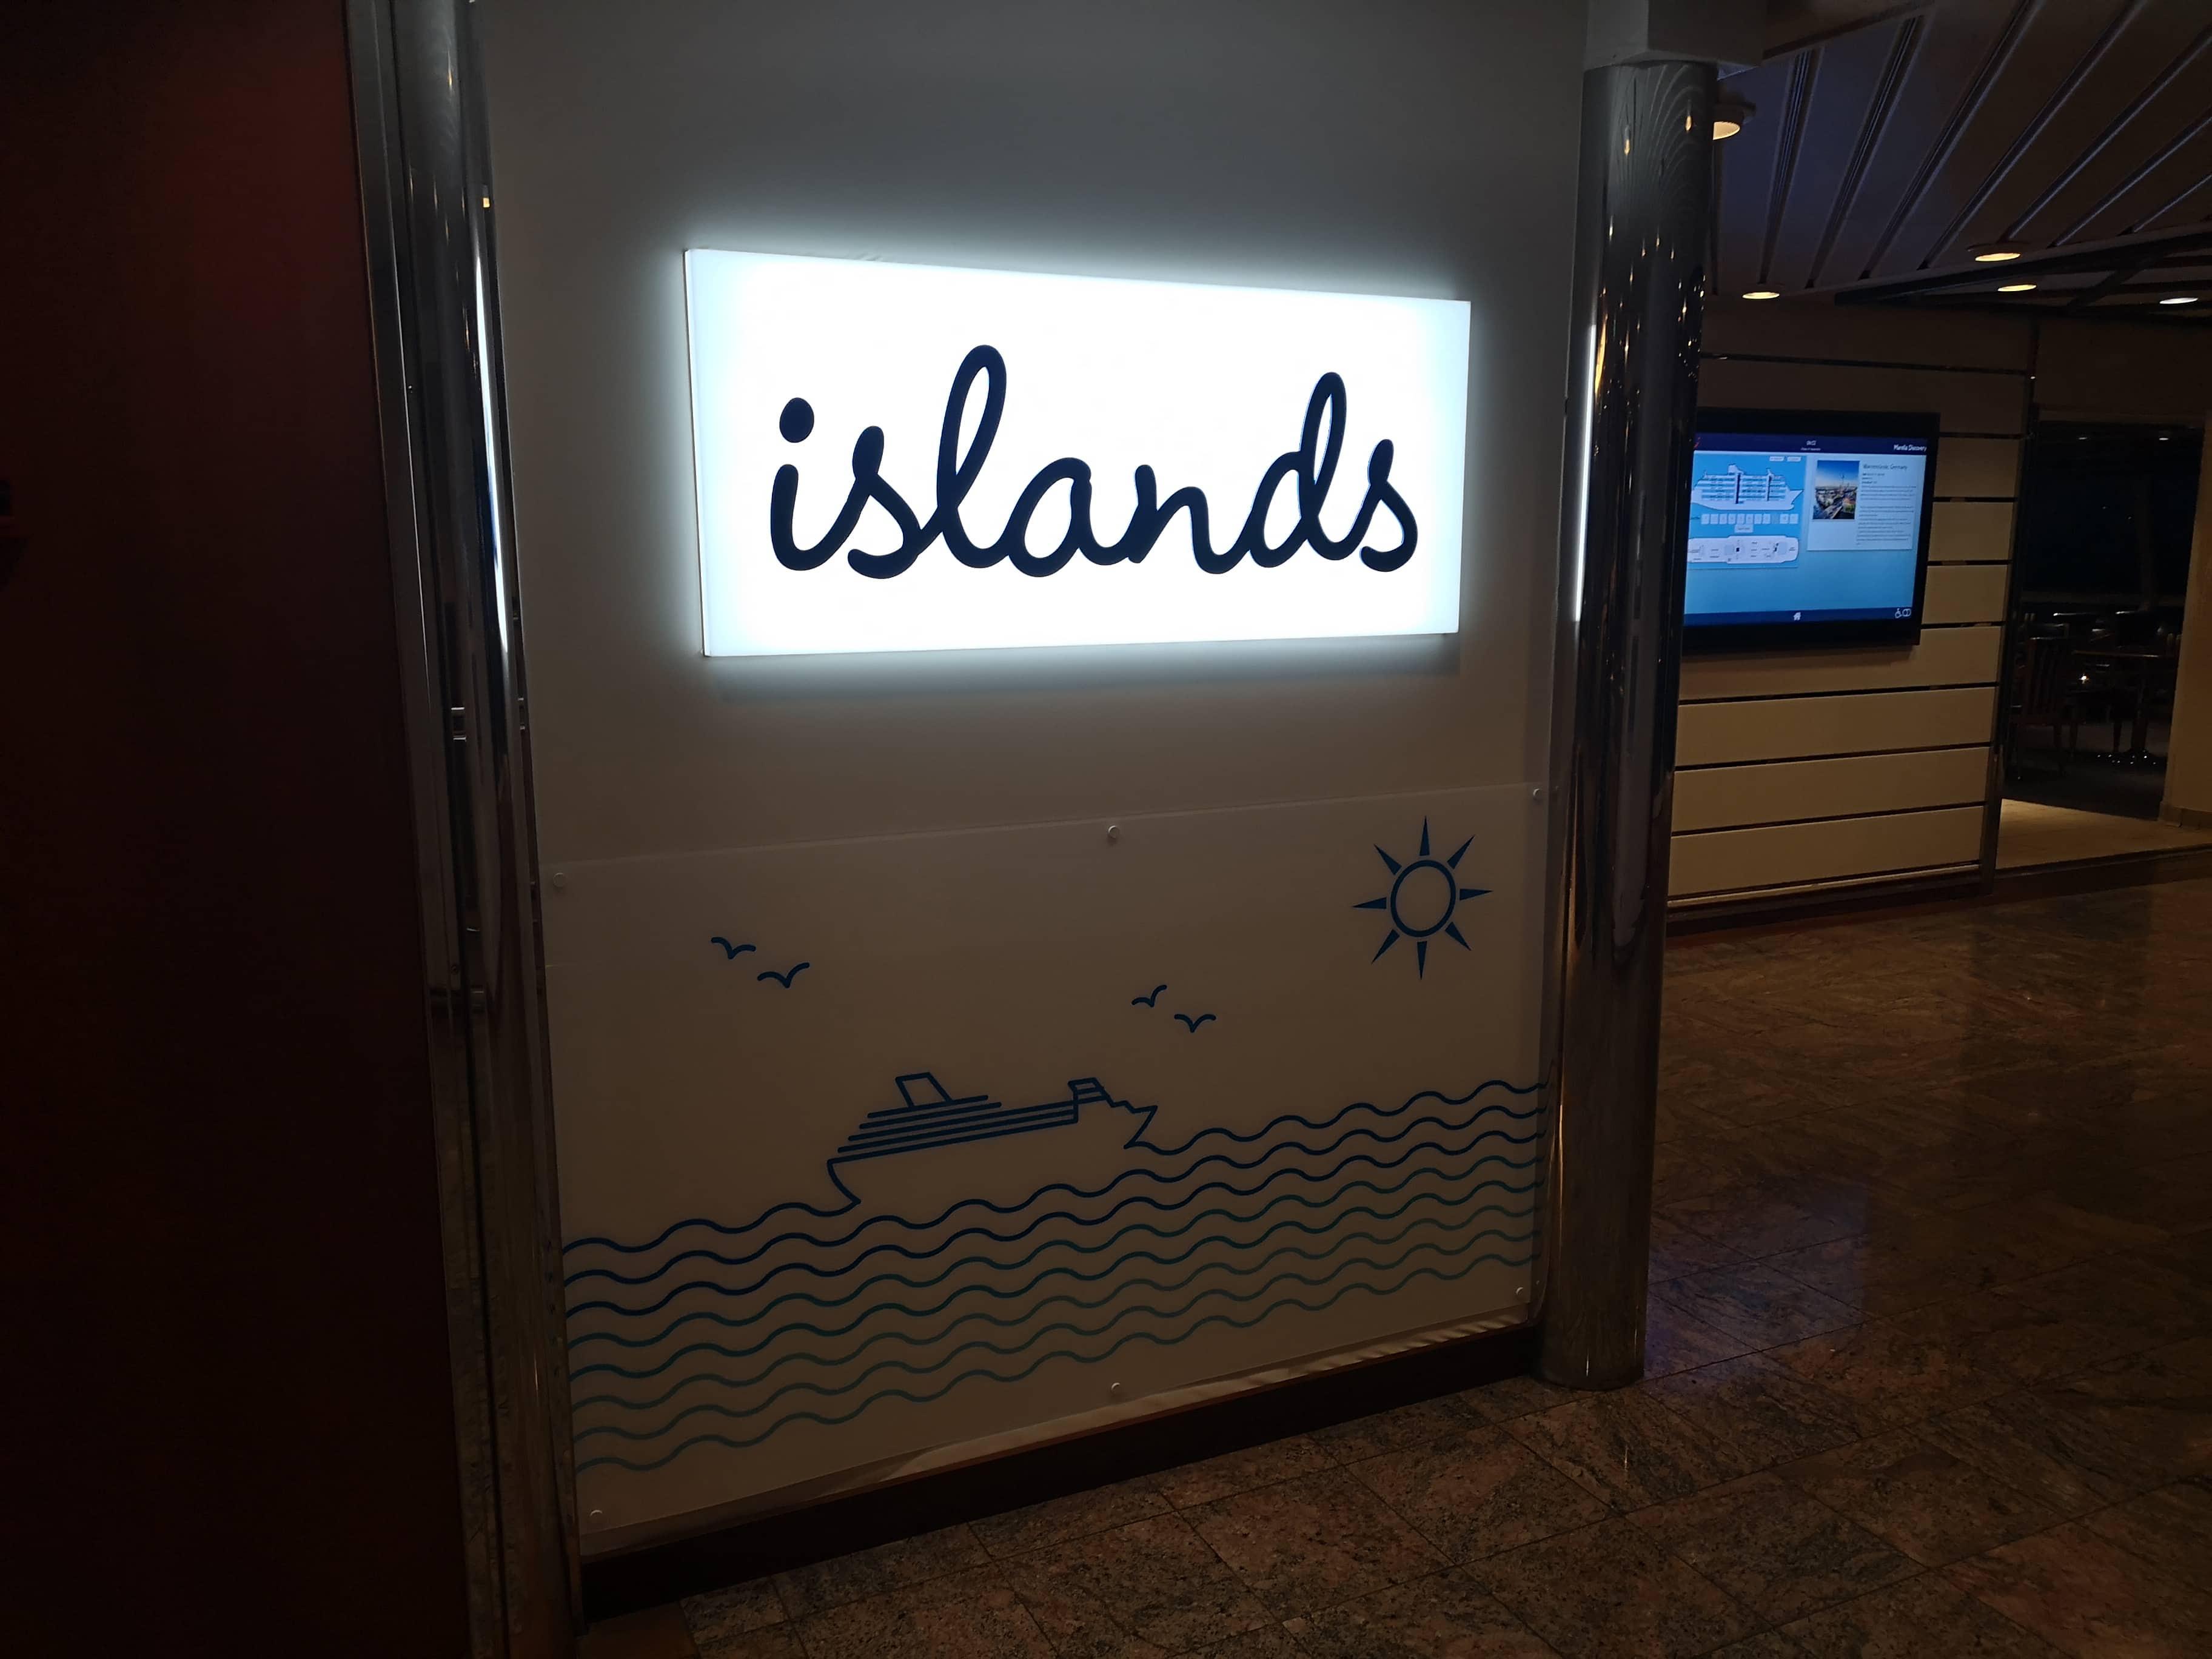 Marella Discovery Buffet food Islands